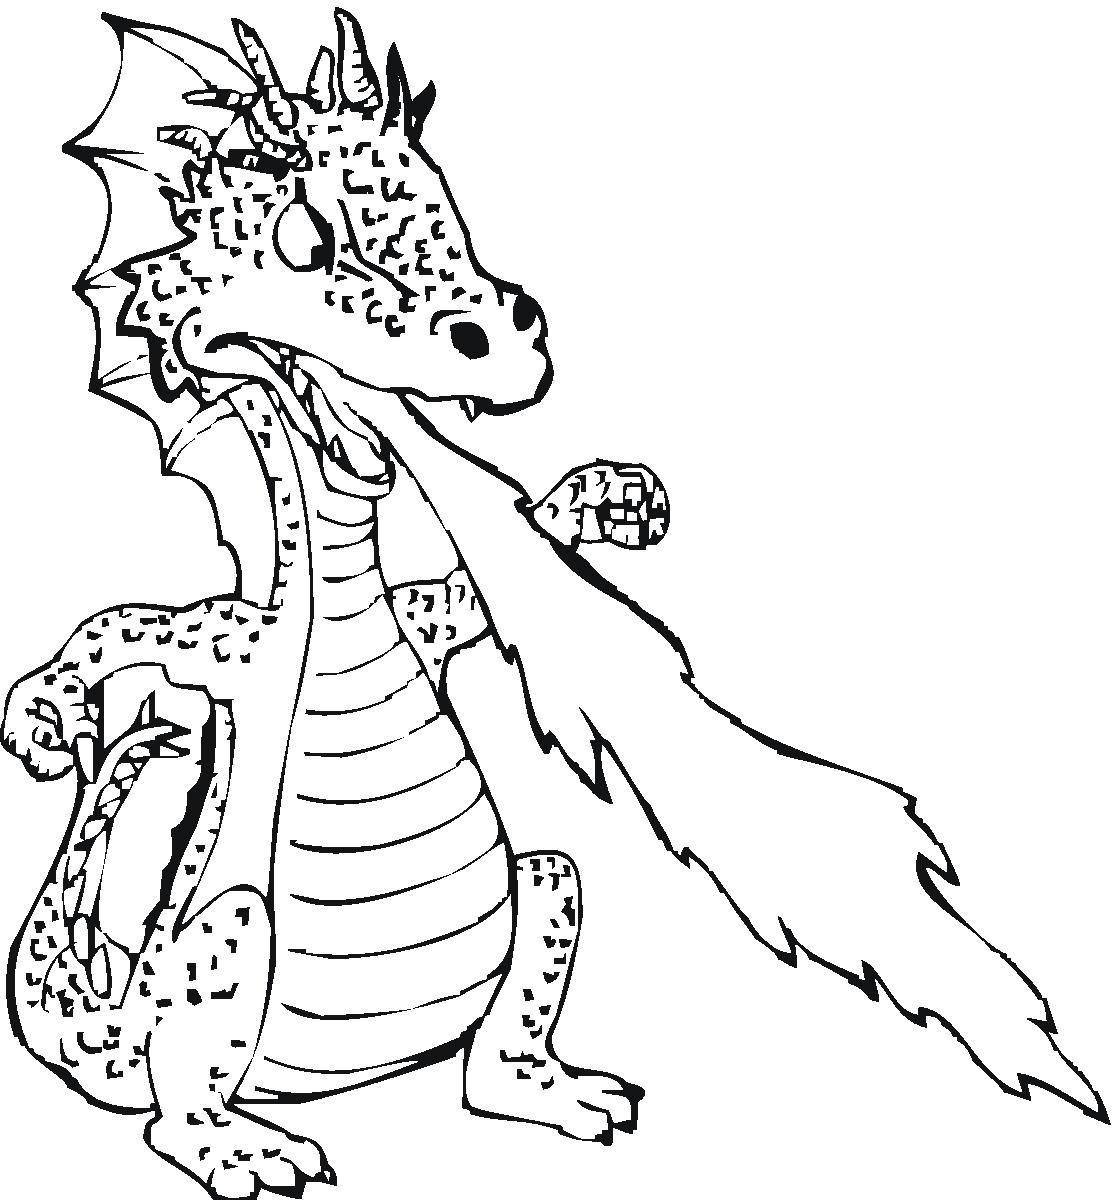 dragon images for kids free printable dragon coloring pages for kids dragon cp images dragon kids for